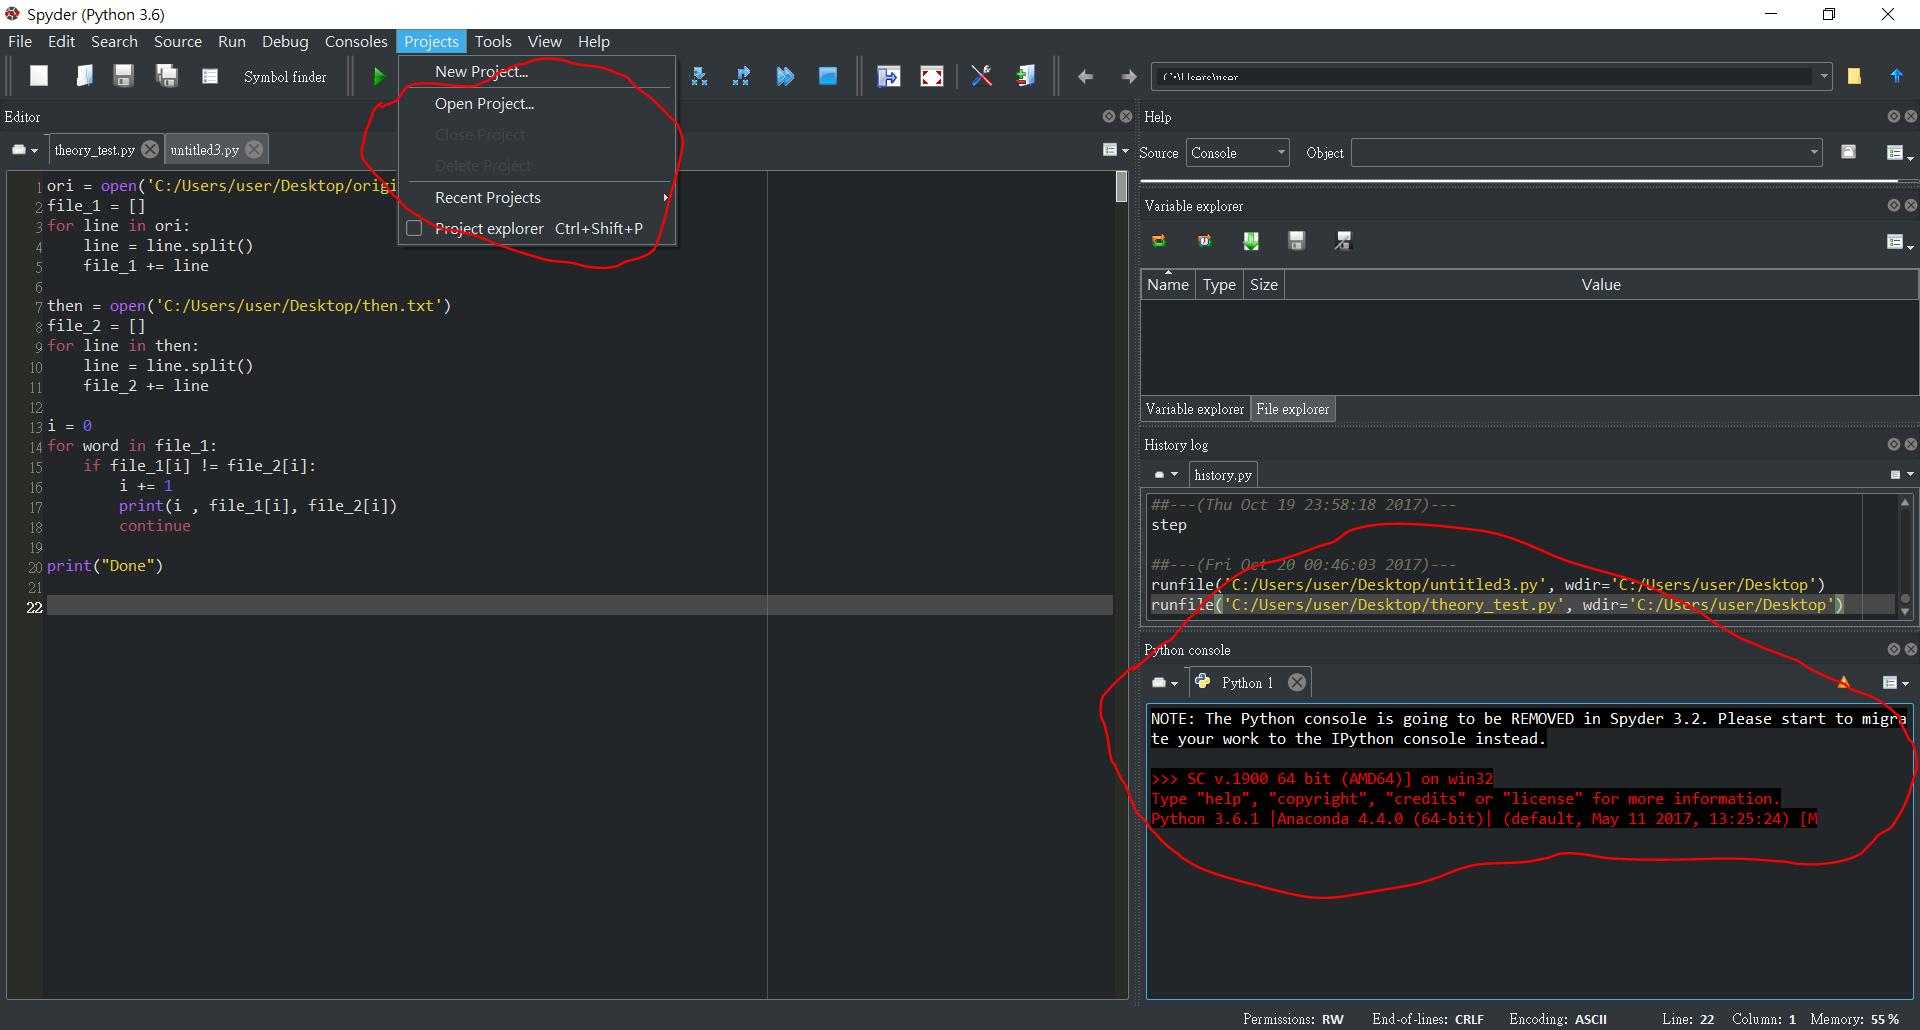 Developers - Add a Spyder dark theme -